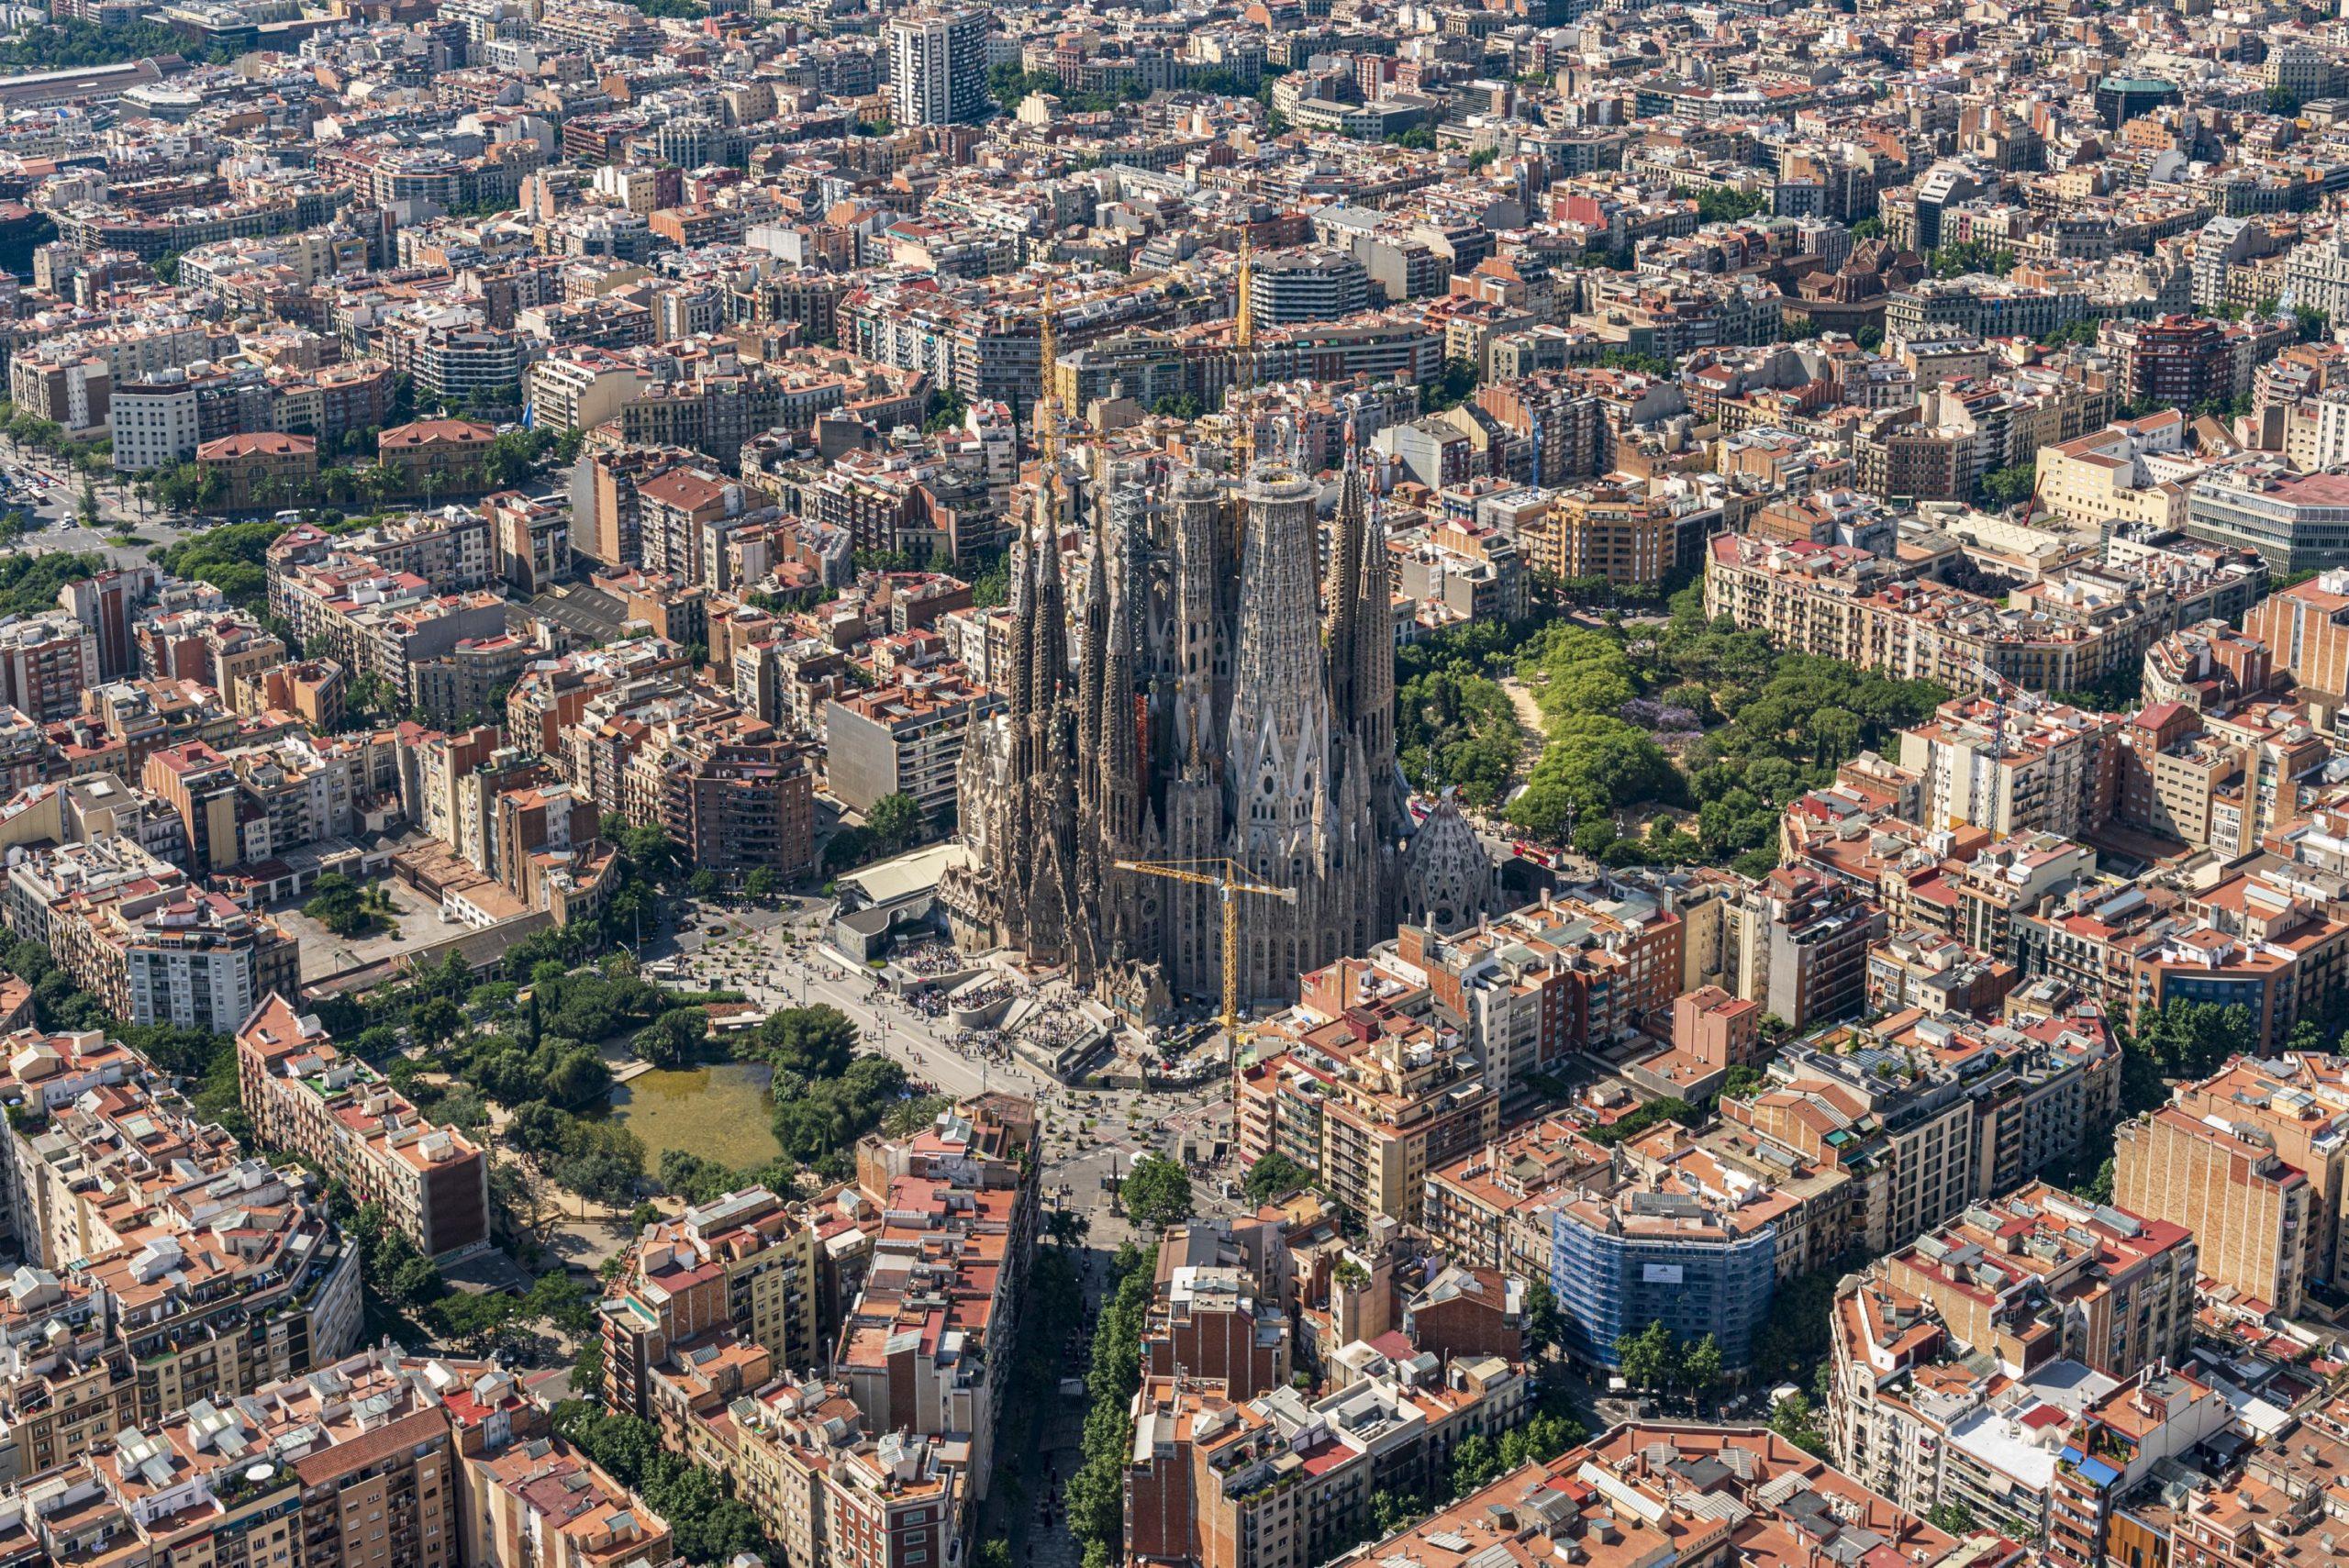 Vista aèria de la Sagrada Família / Cedida